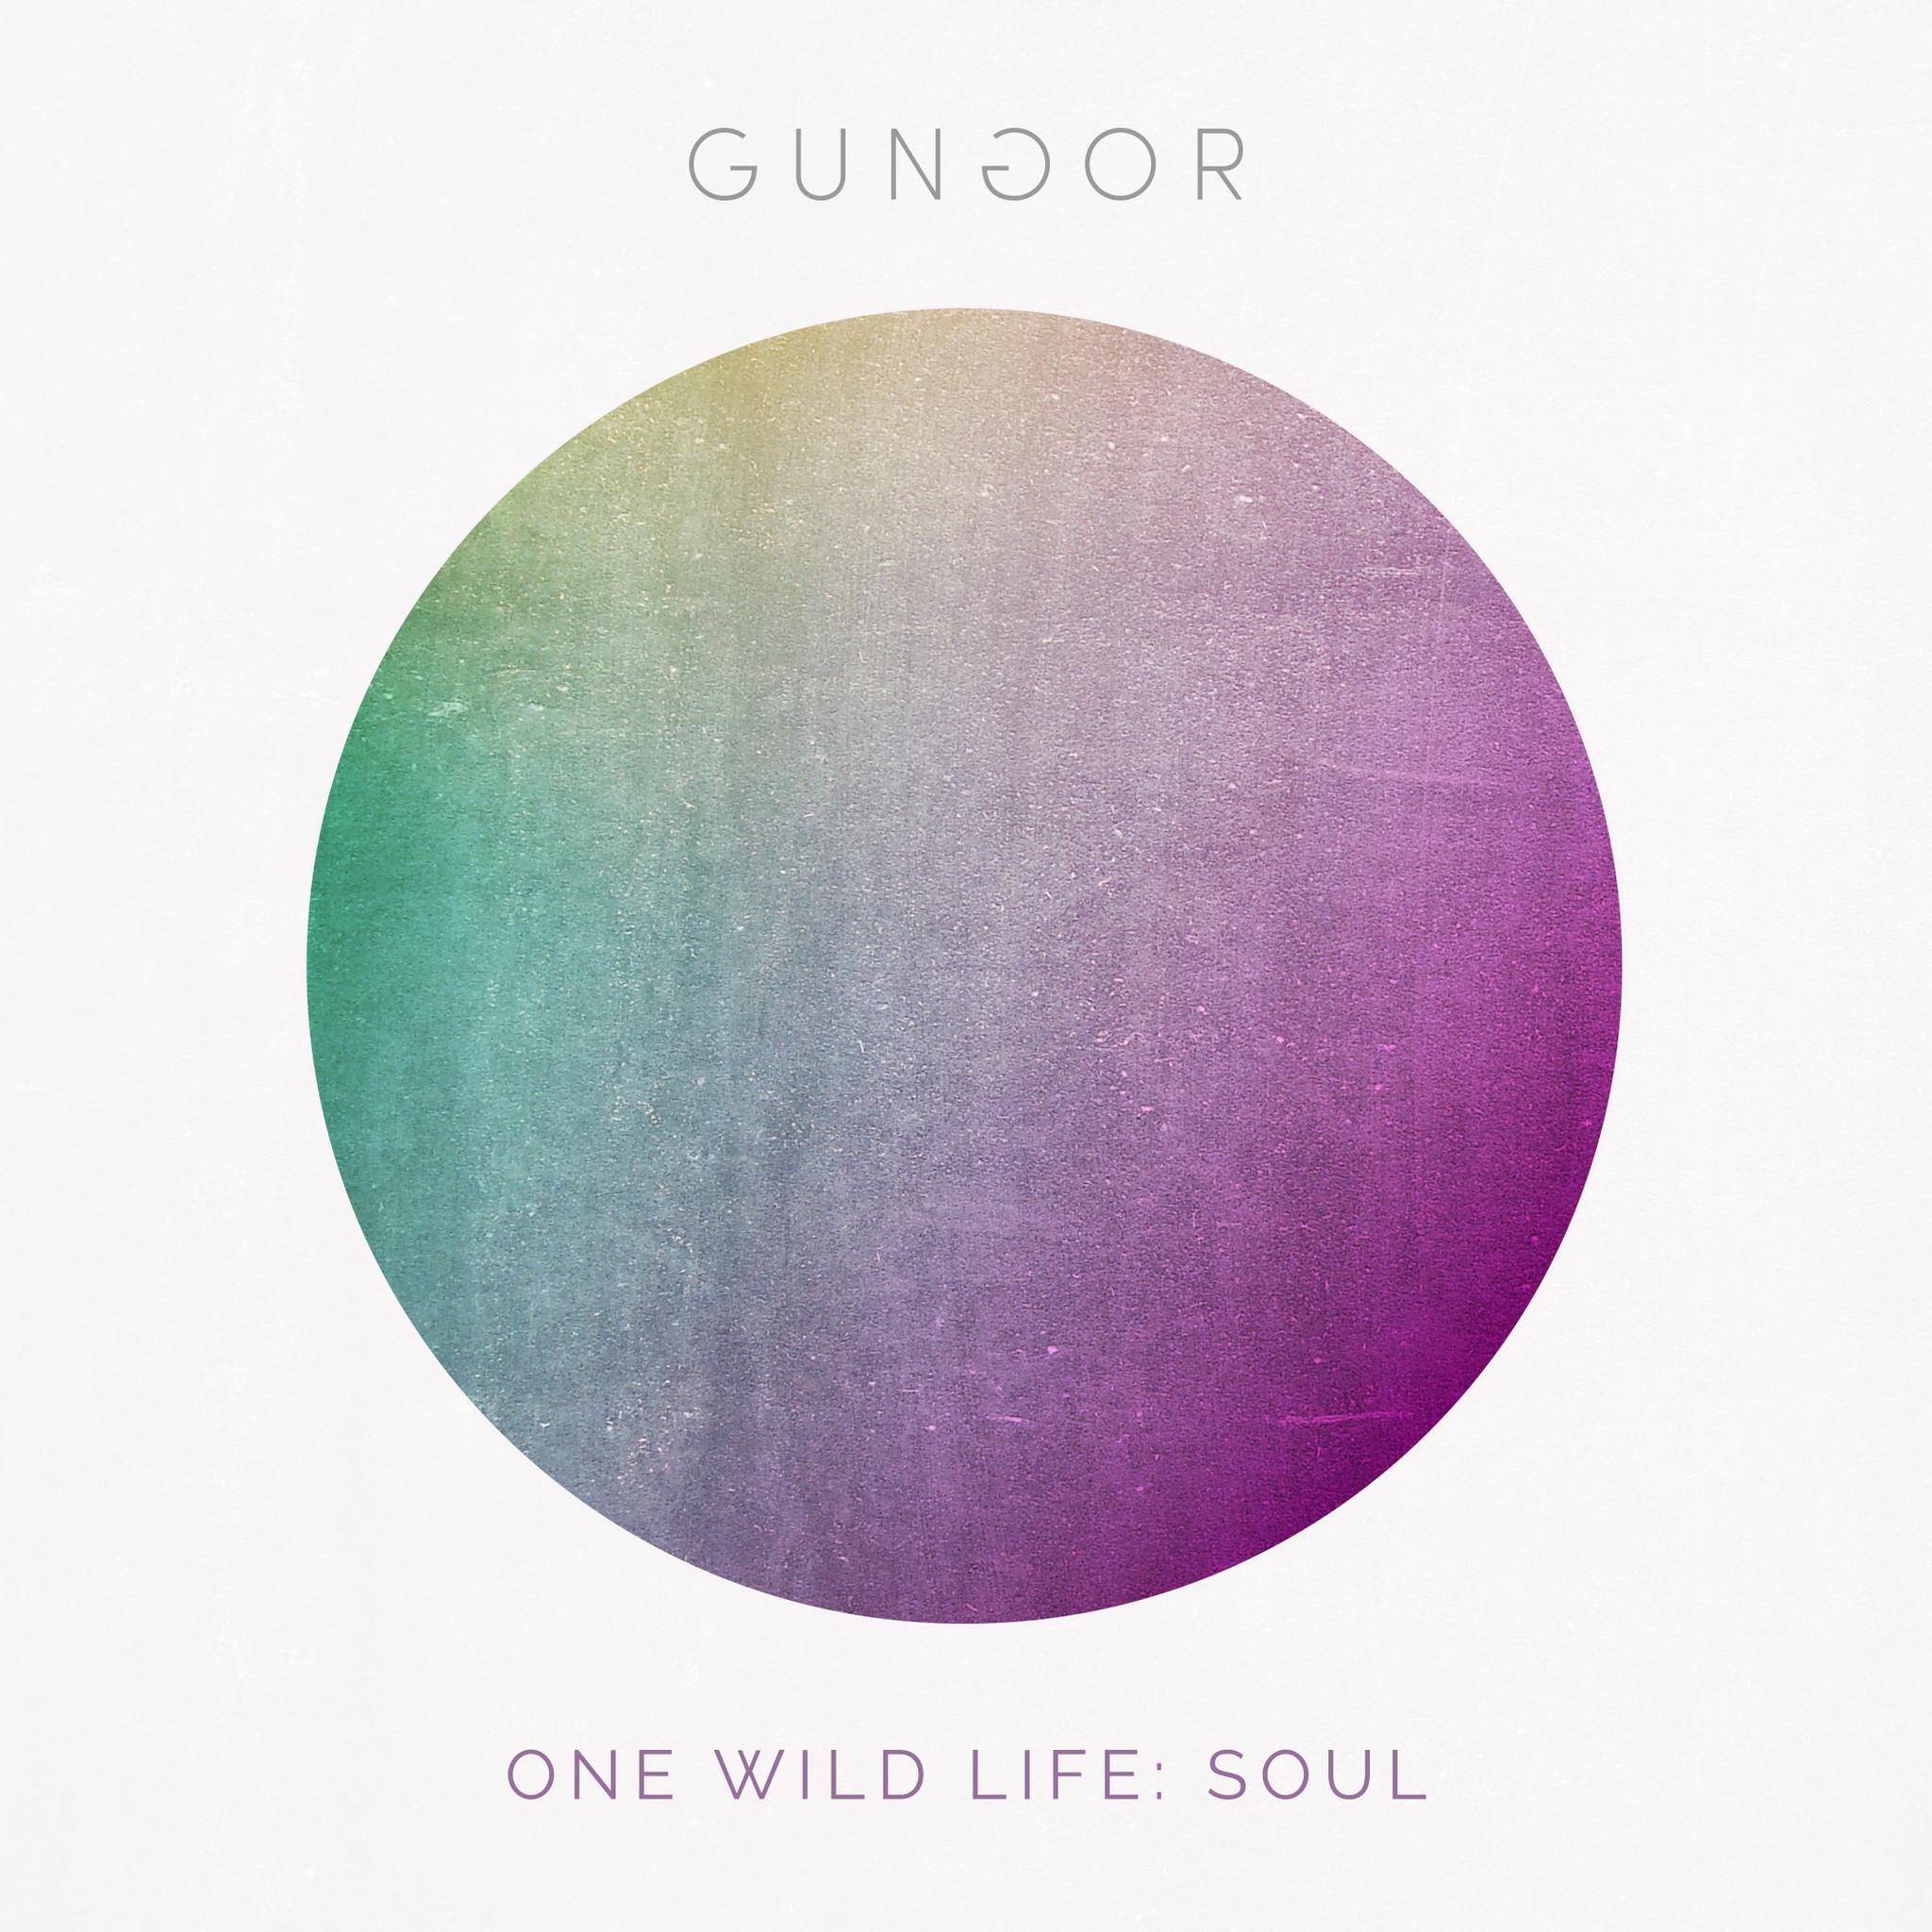 Gungor - One Wild Life: Soul